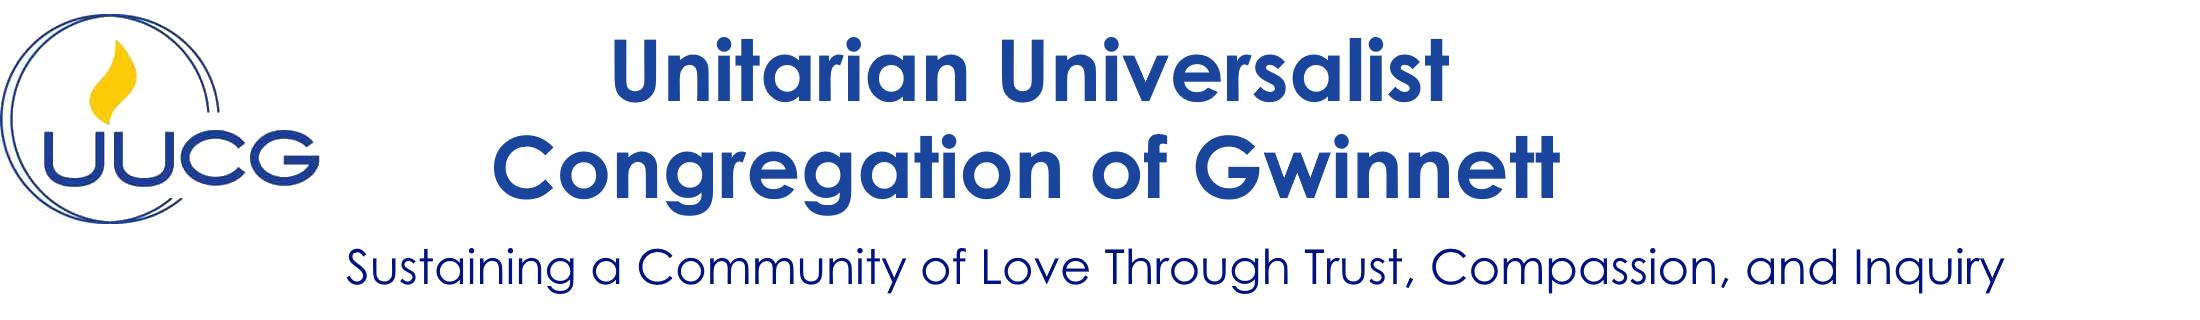 Unitarian Universalist Congregation of Gwinnett